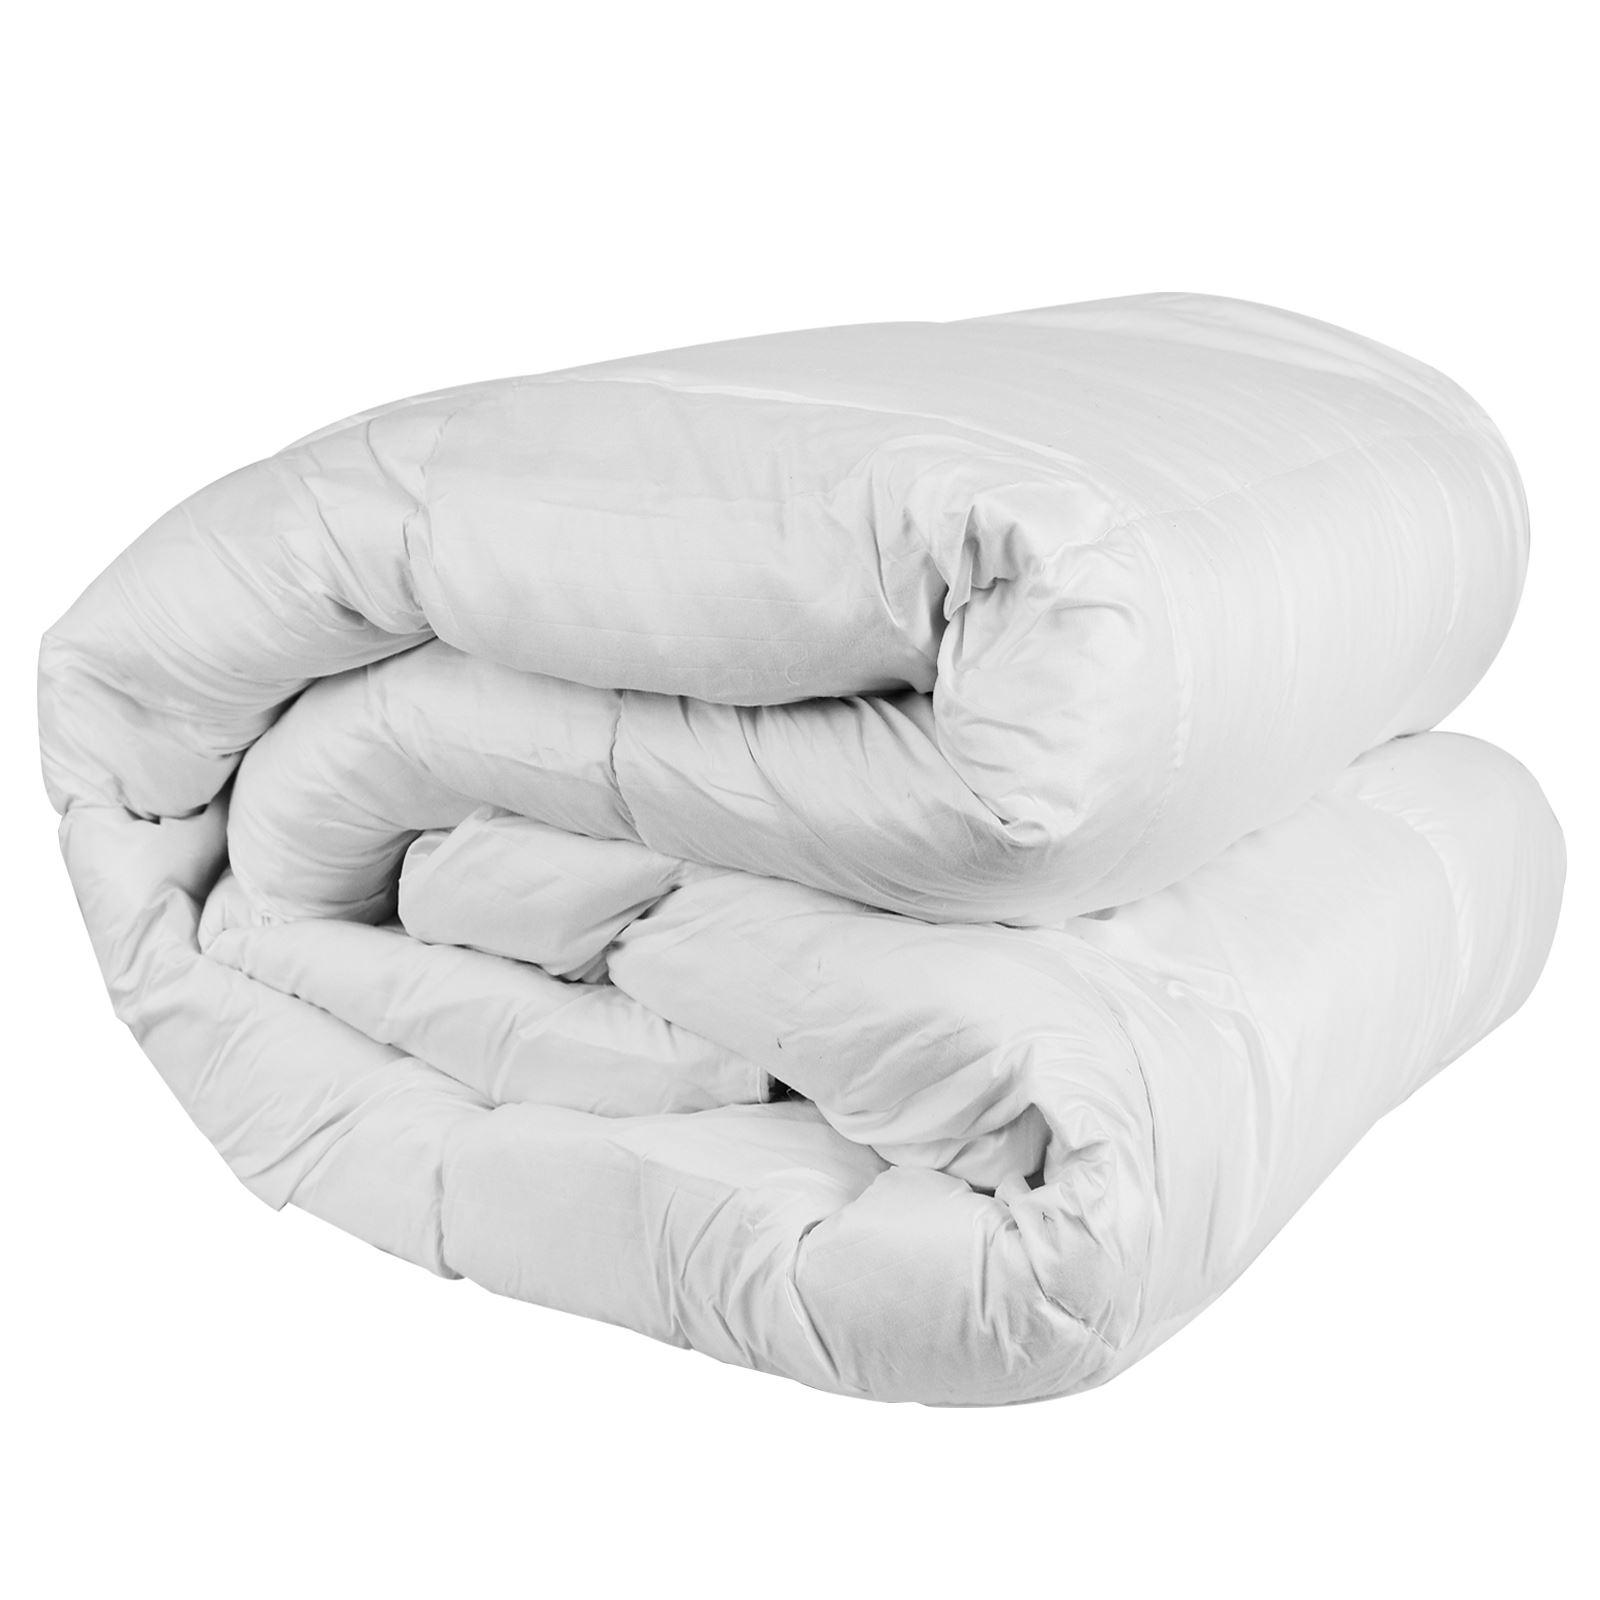 Lujo-Pluma-De-Pato-Abajo-Edredon-Ropa-De-Cama-Edredon-relleno-confortable-13-5-15-Tog miniatura 5